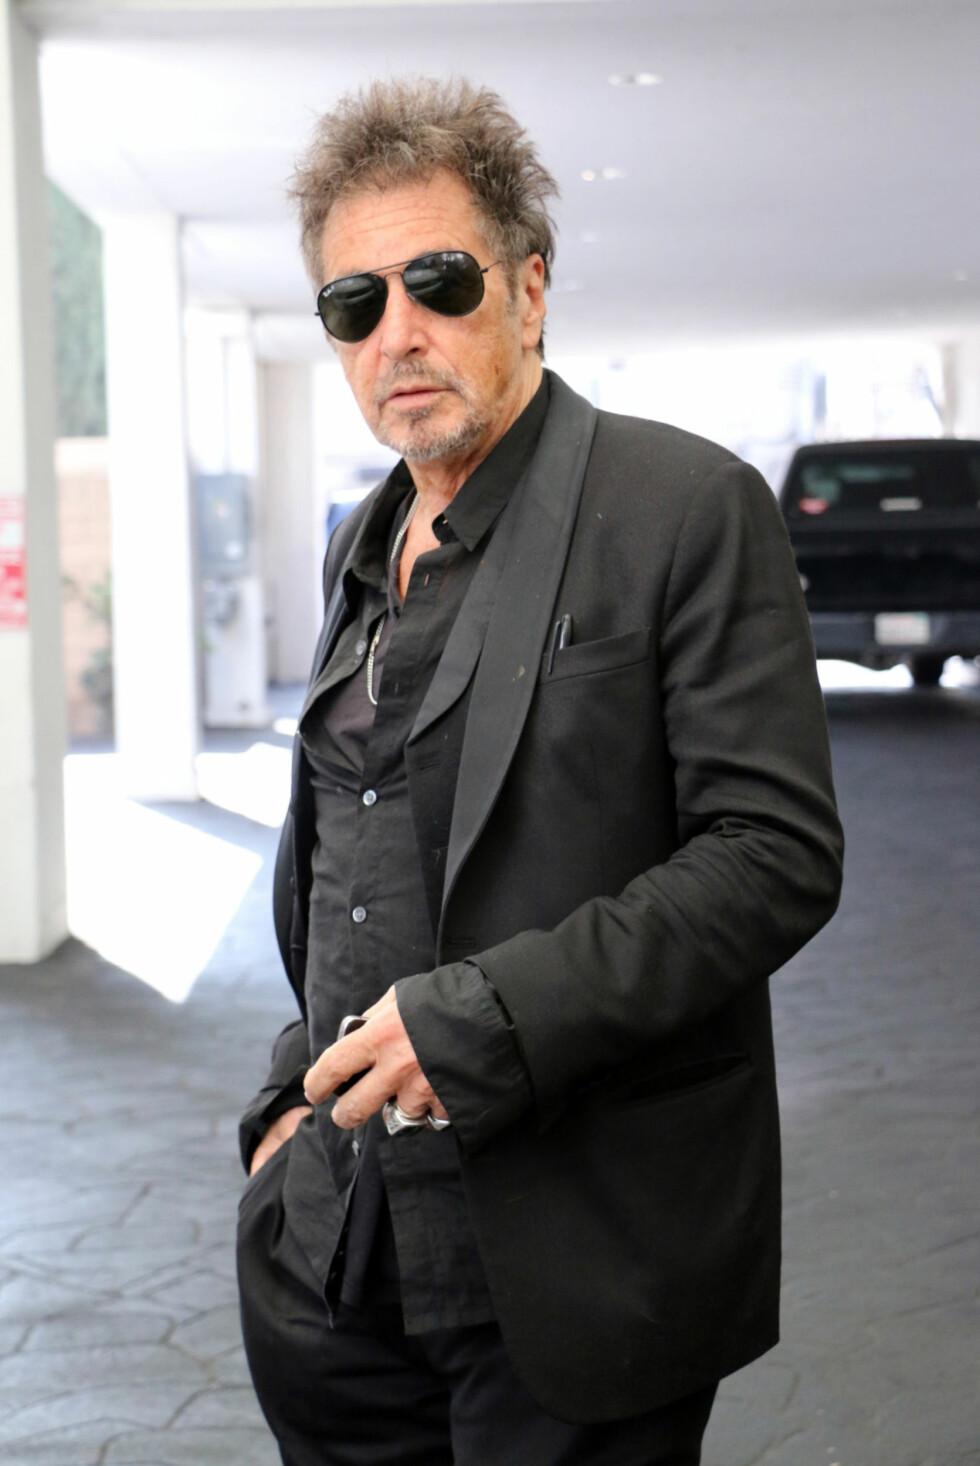 ALDRI VÆRT GIFT: Skuespiller Al Pacino (75). Foto: NTB Scanpix